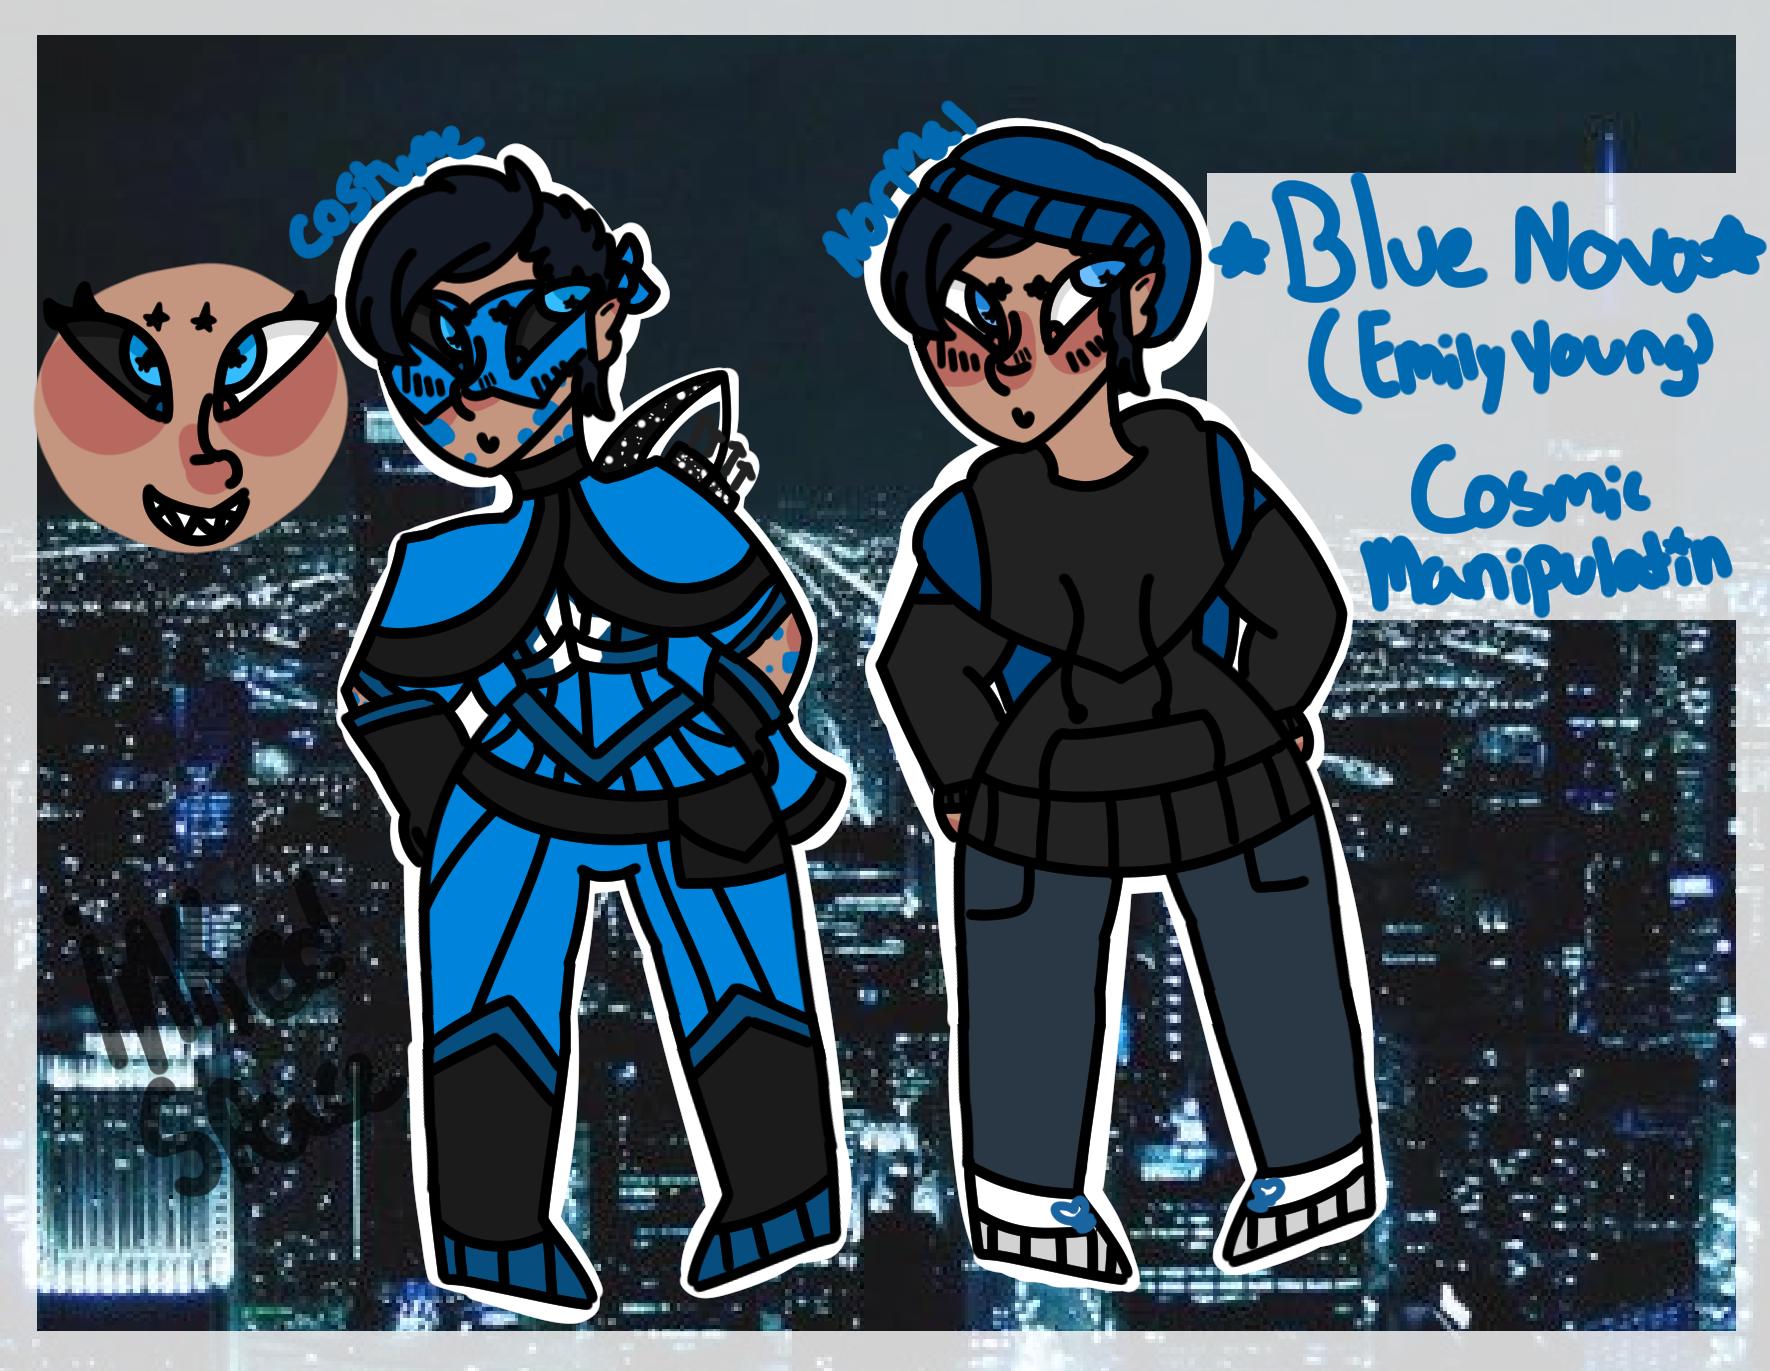 Blue Nova on Toyhouse